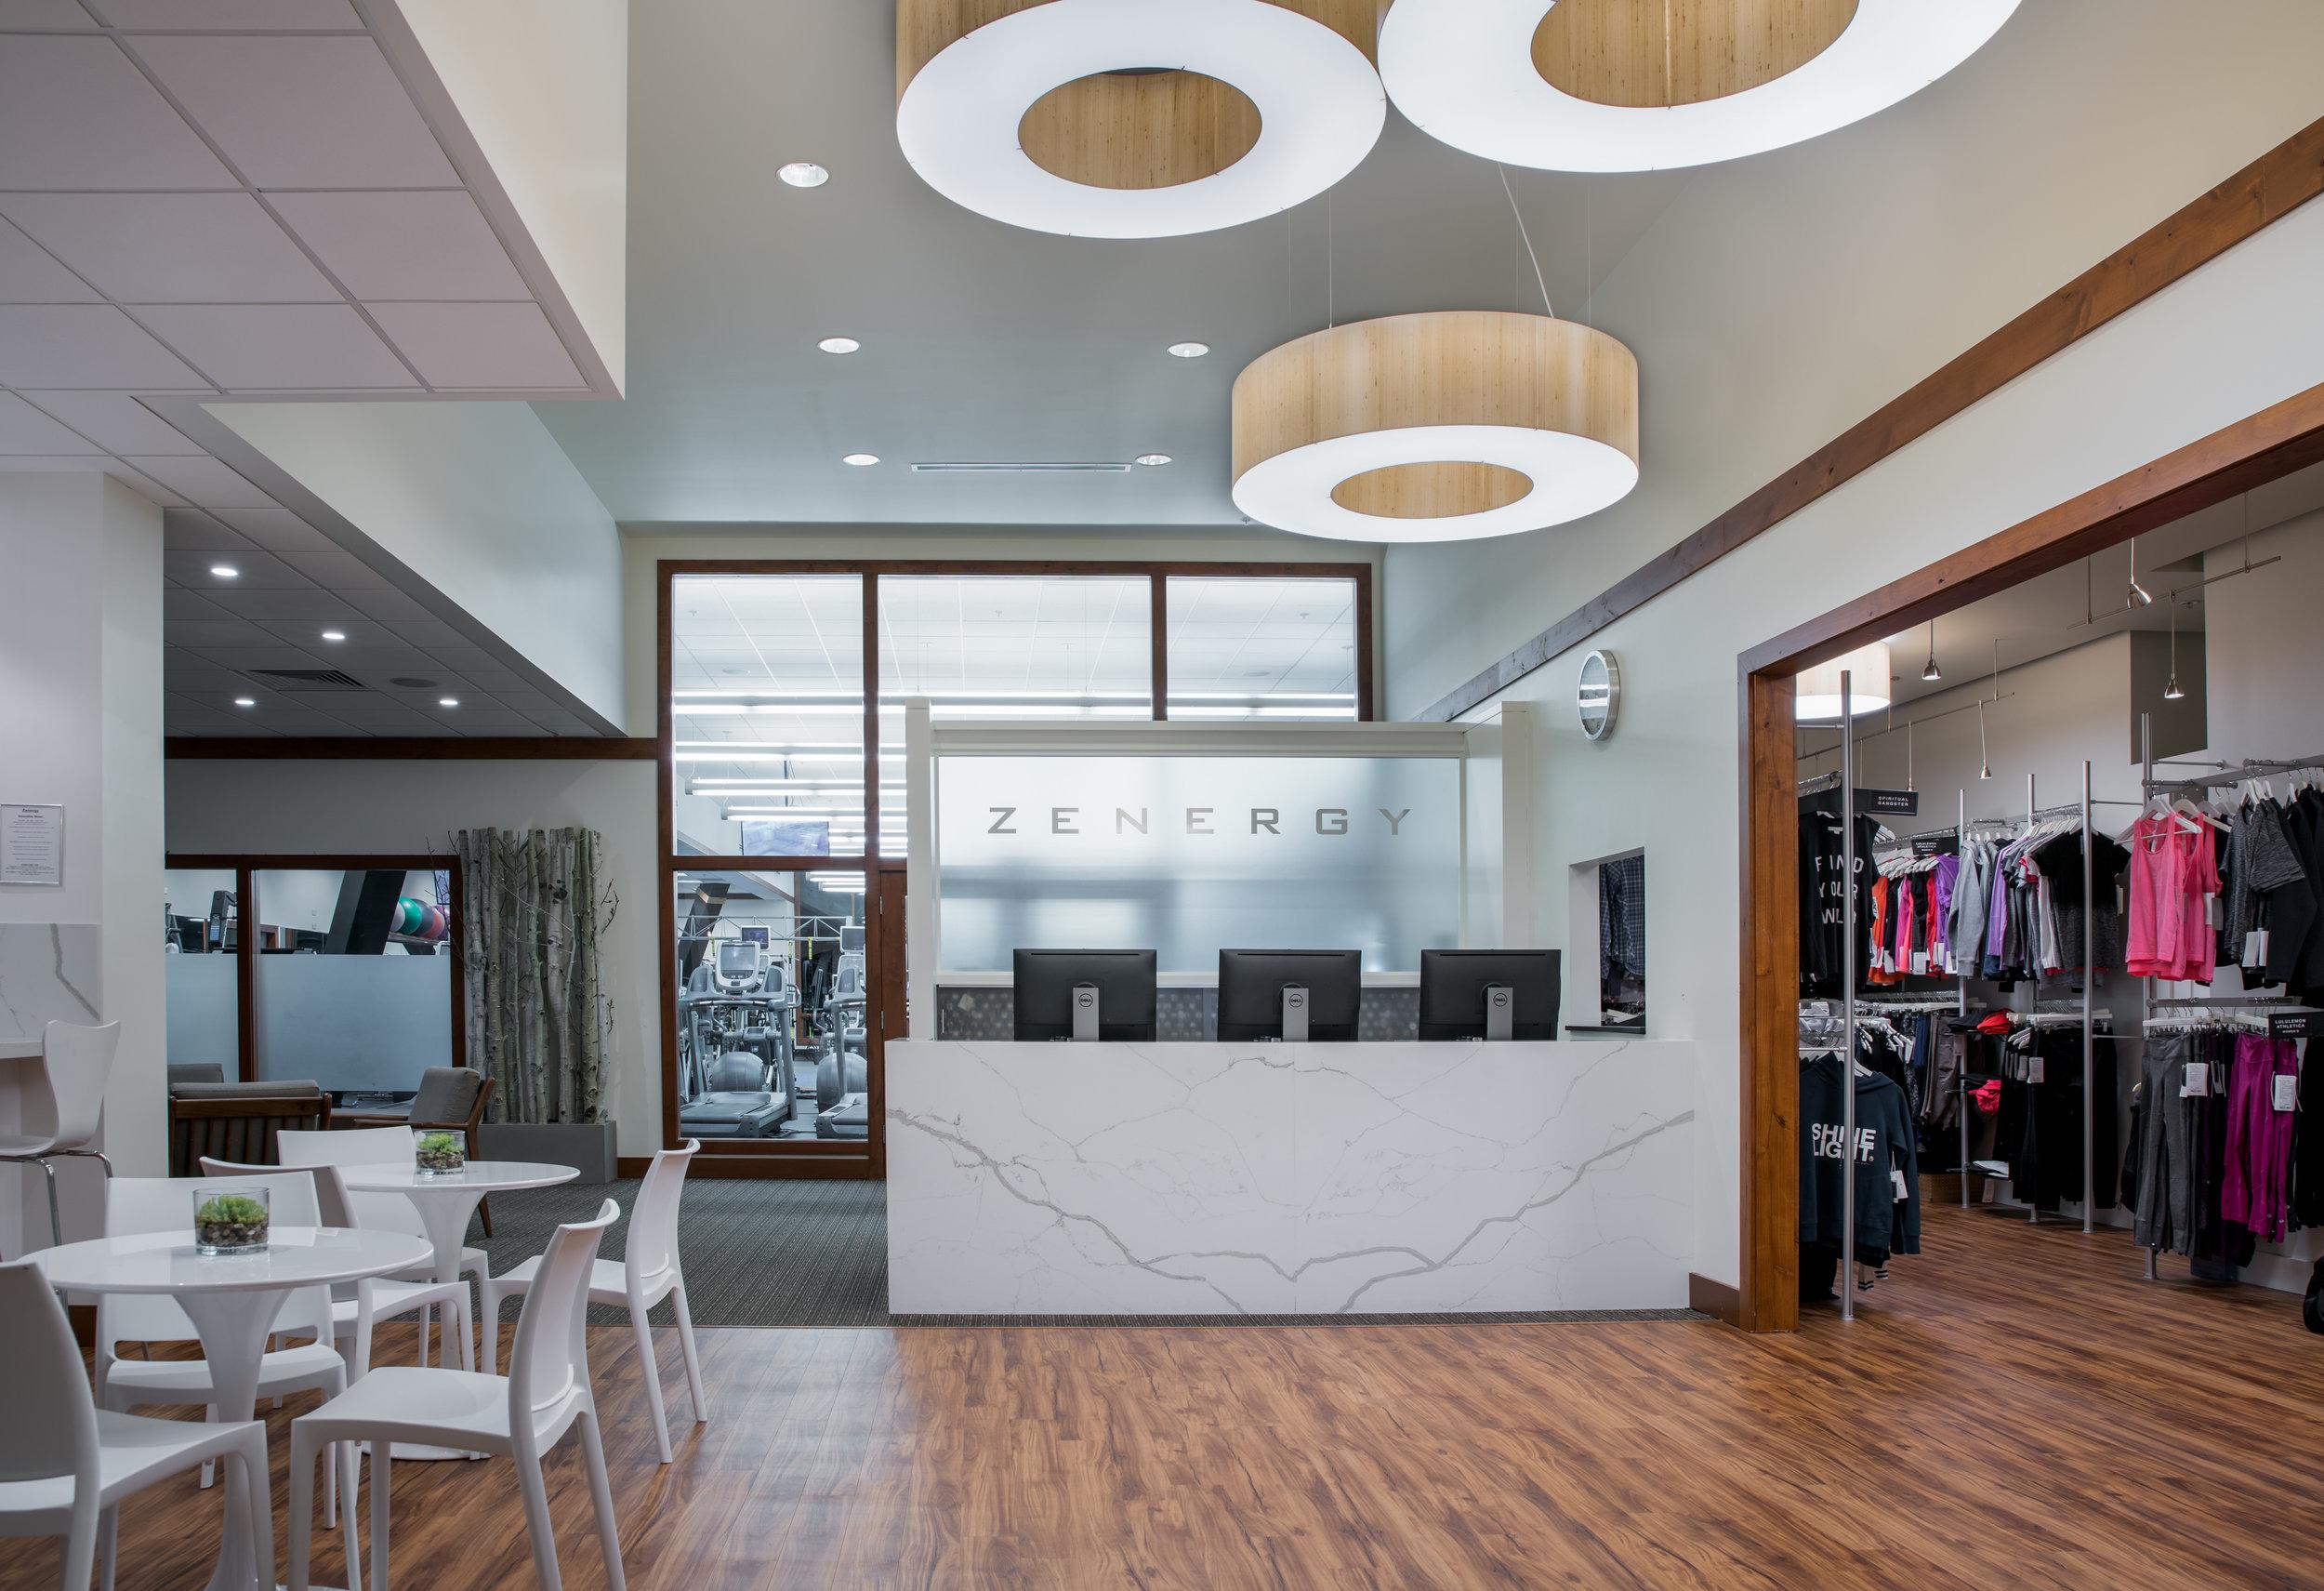 Latham Interior Design - Zenergy Finished Project February 2 2017-09513-Edit copy.jpg